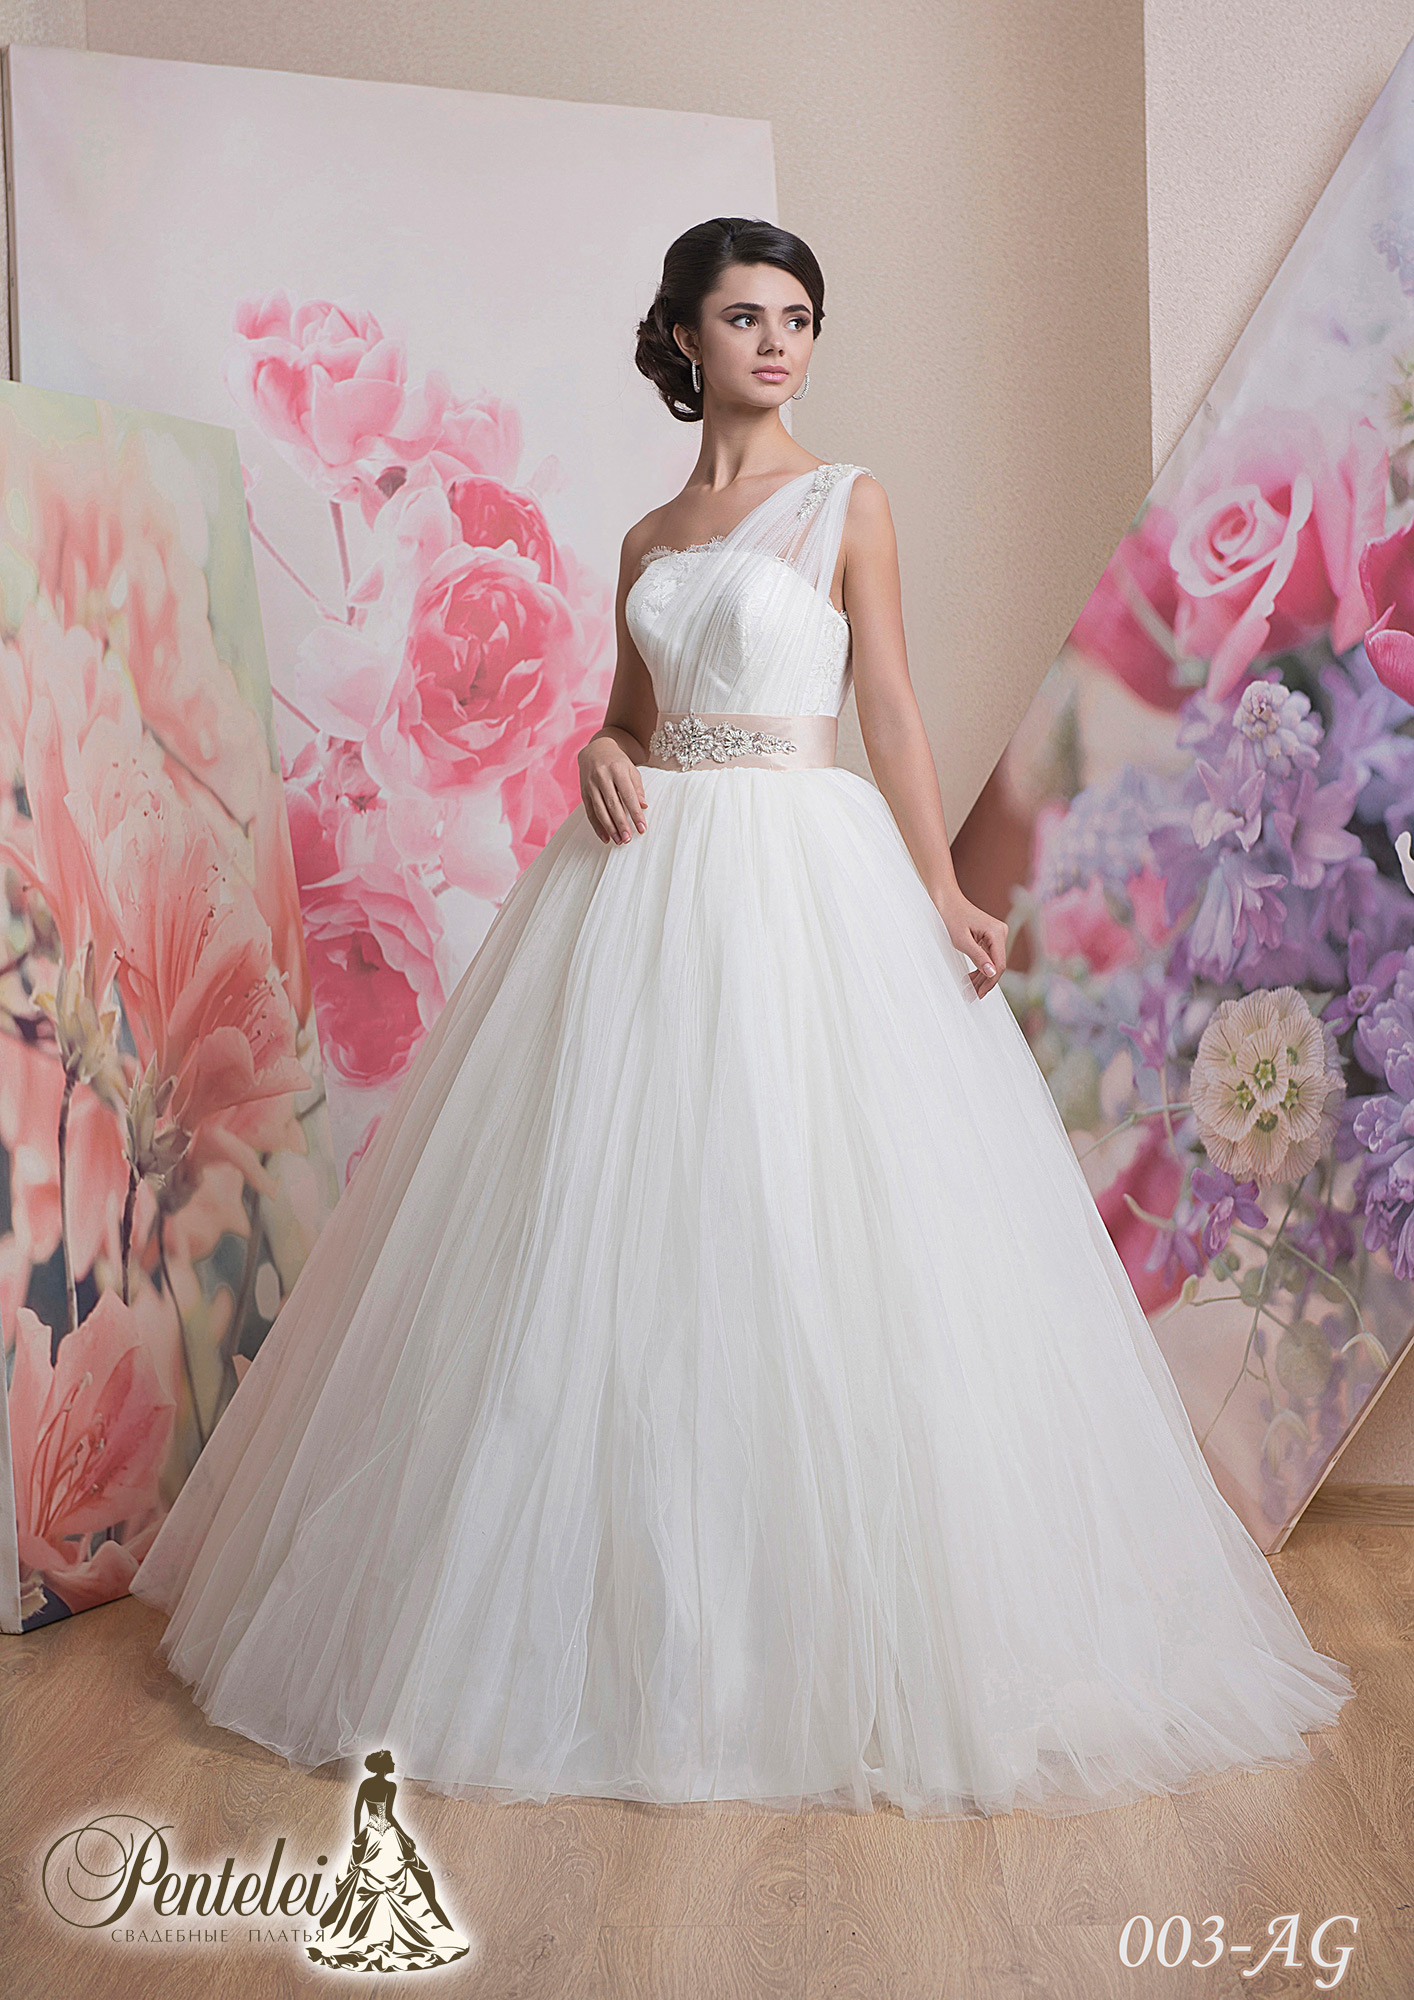 003-AG | Cumpăra rochii de mireasă en-gros de Pentelei